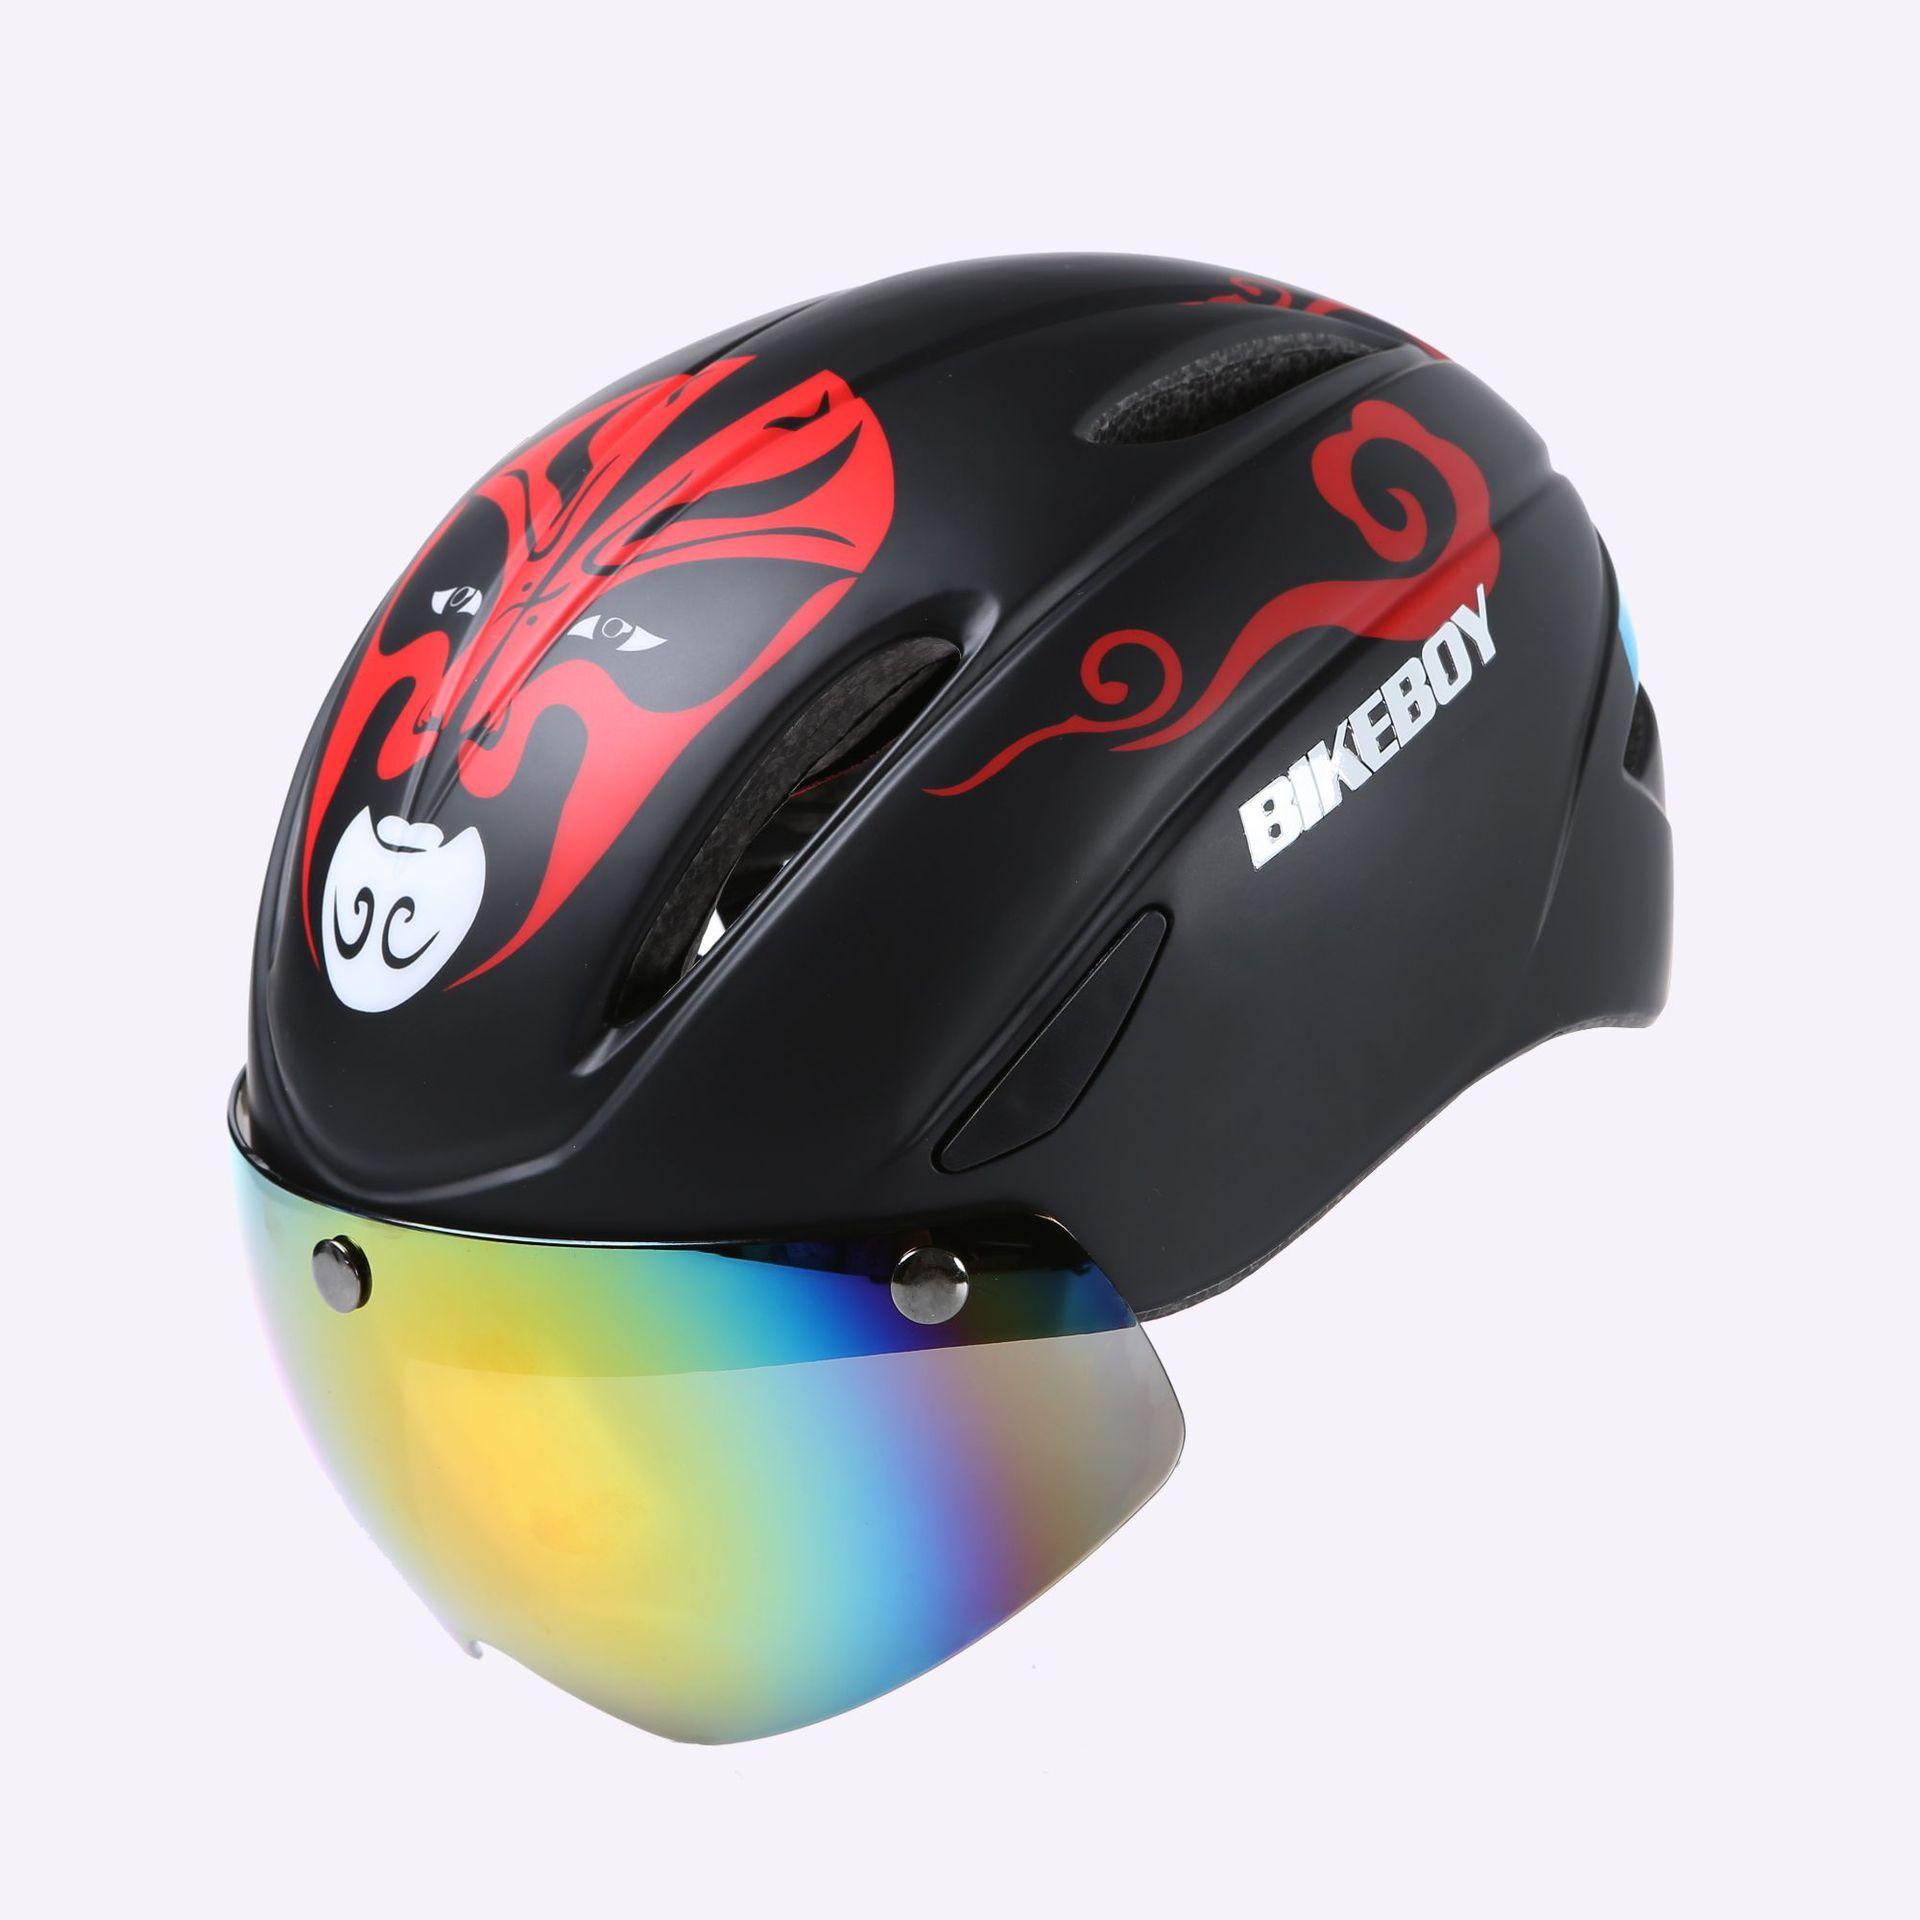 Bikeboy Riding Helmet Glasses One-piece Men Road Bike Mountain Bike Helmet Bicycle Helmet Restraint Goggles Pattern B - matte_Free size - gray lenses